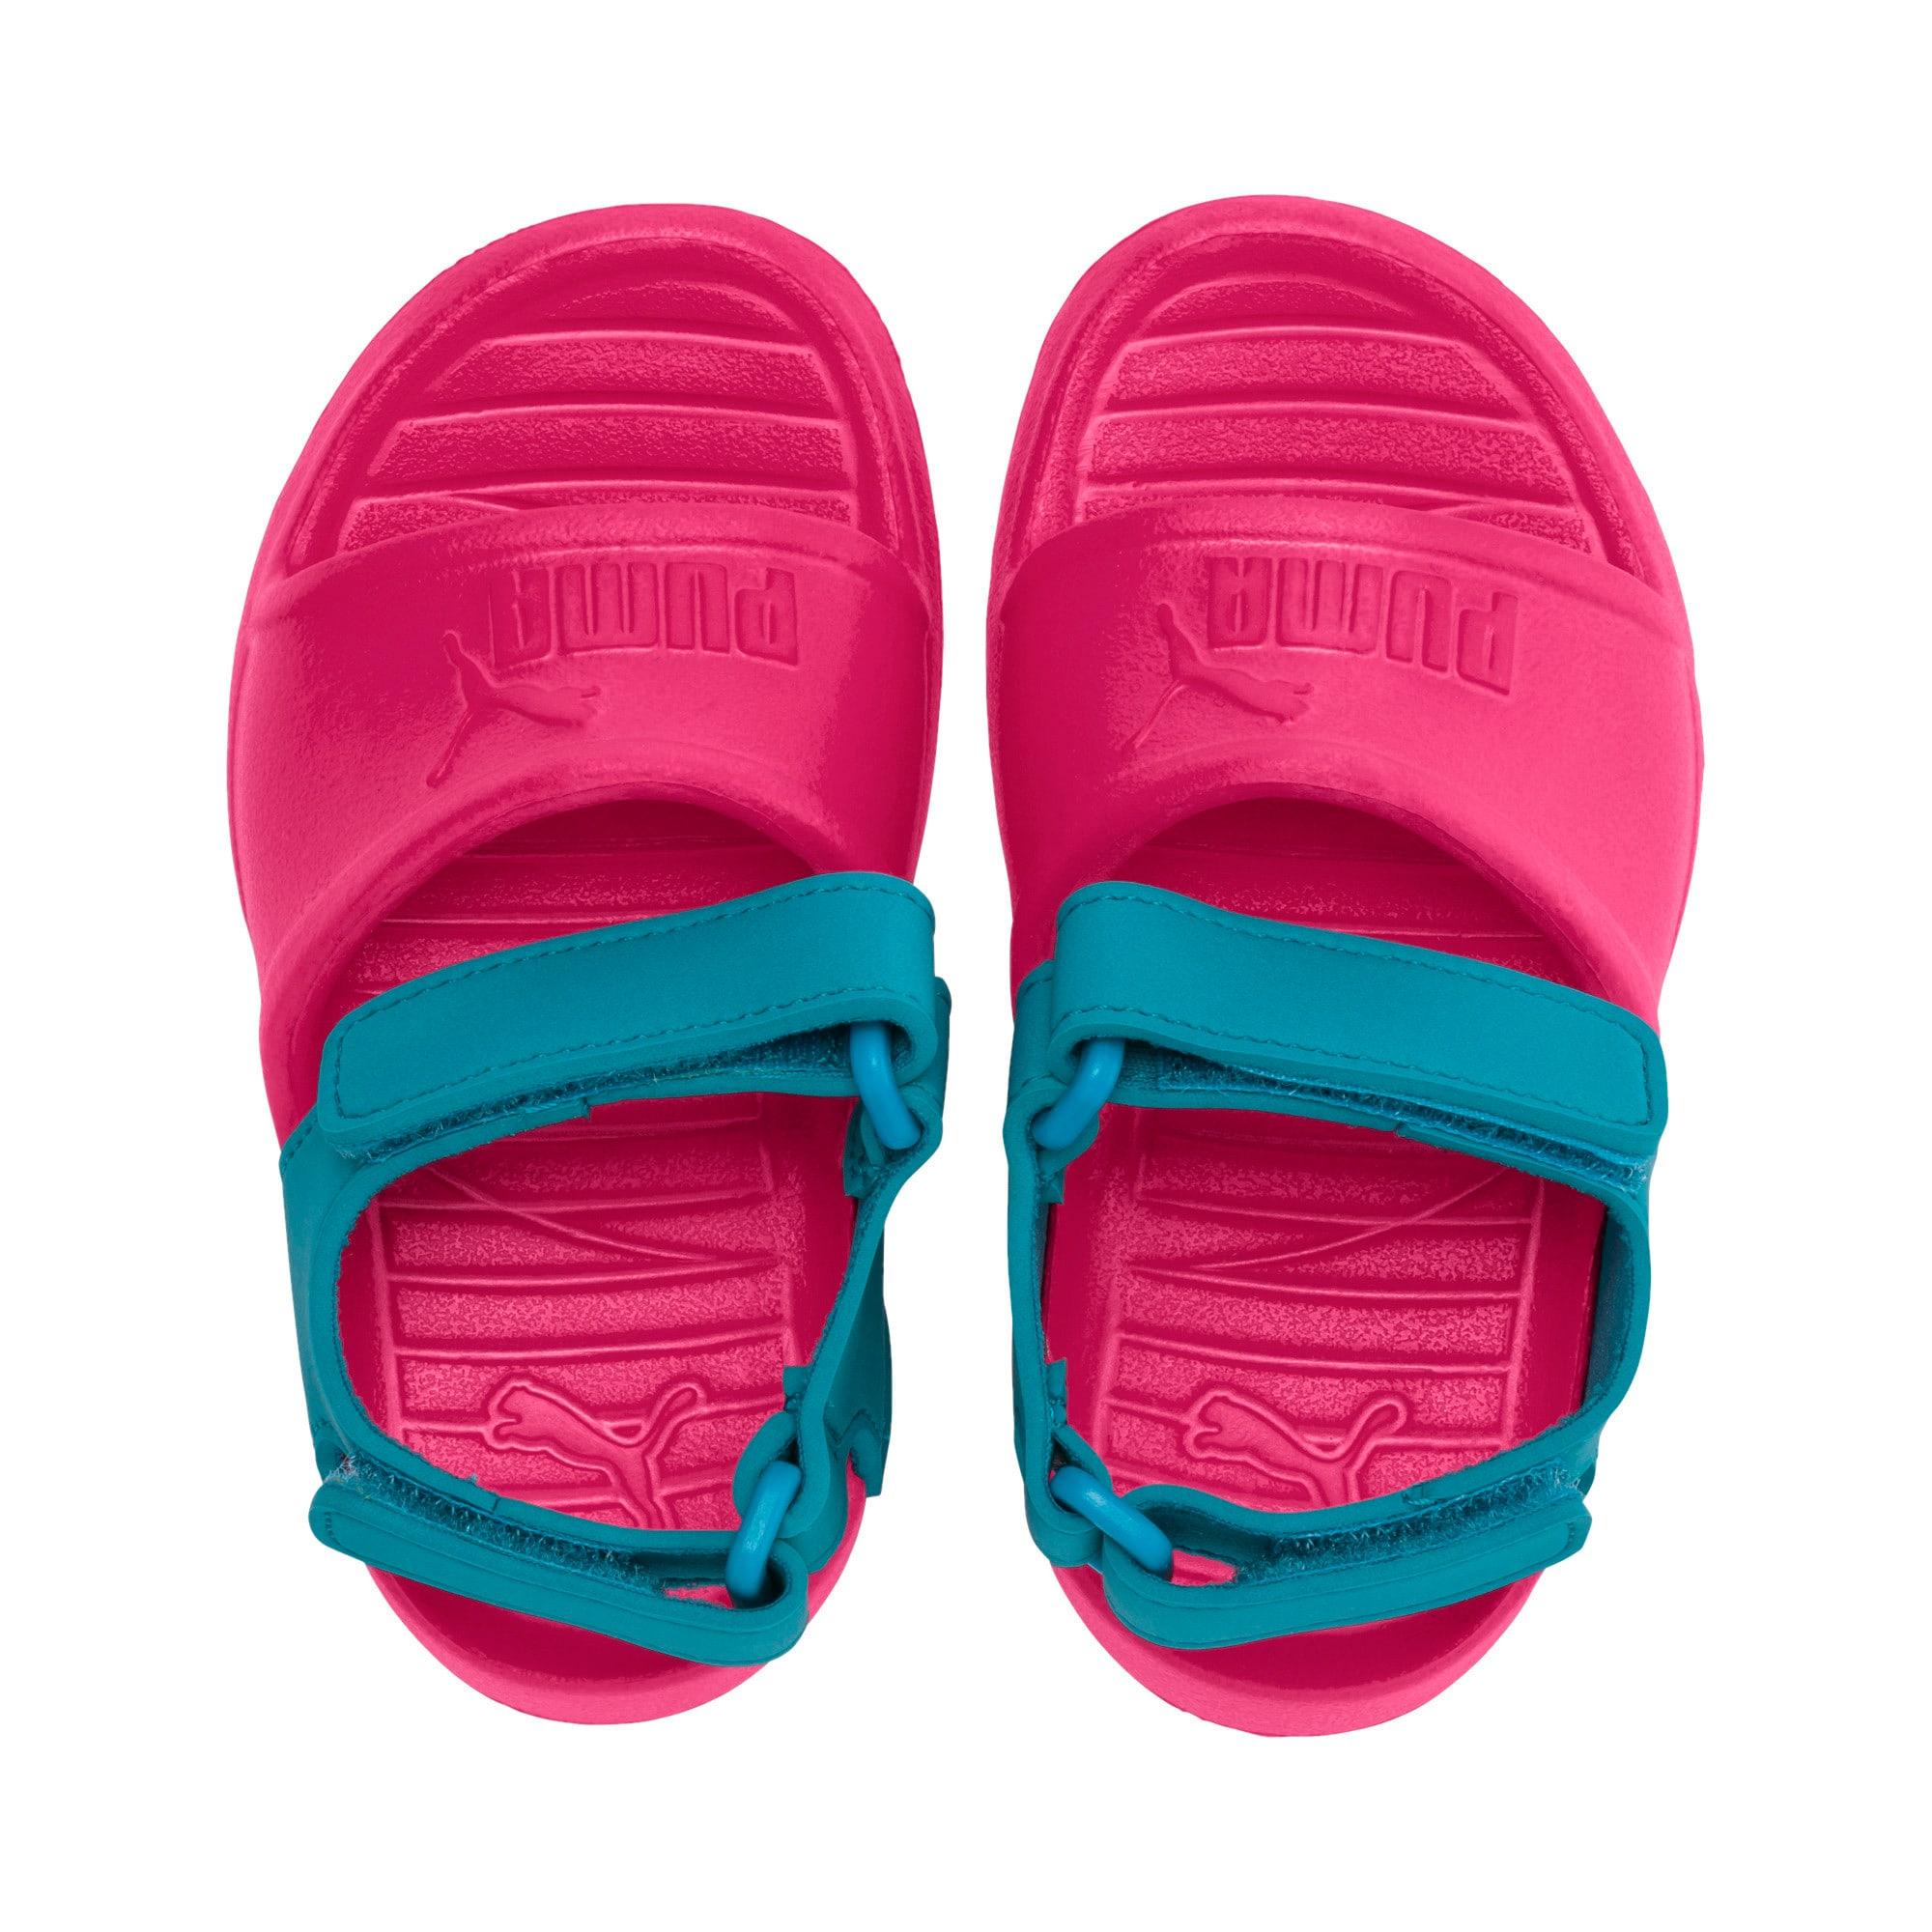 Thumbnail 6 of Divecat v2 Injex sandalen voor kinderen, Fuchsia Purple-Caribbean Sea, medium